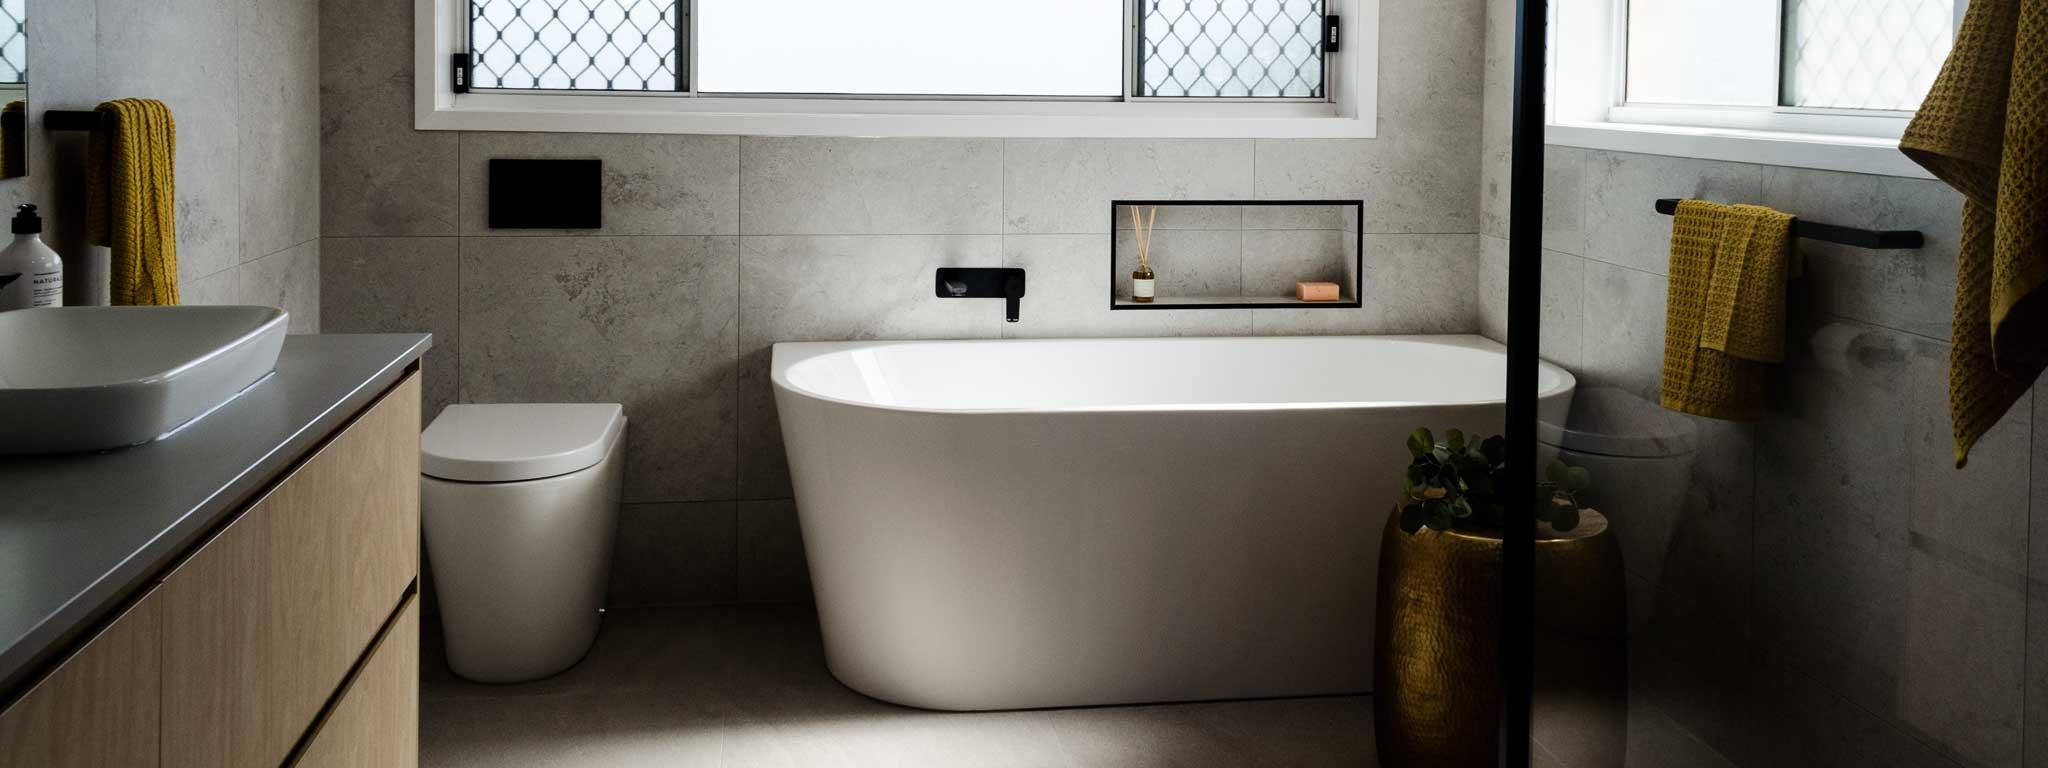 Brisbane Bathrooms Renovator • TAP Bathrooms